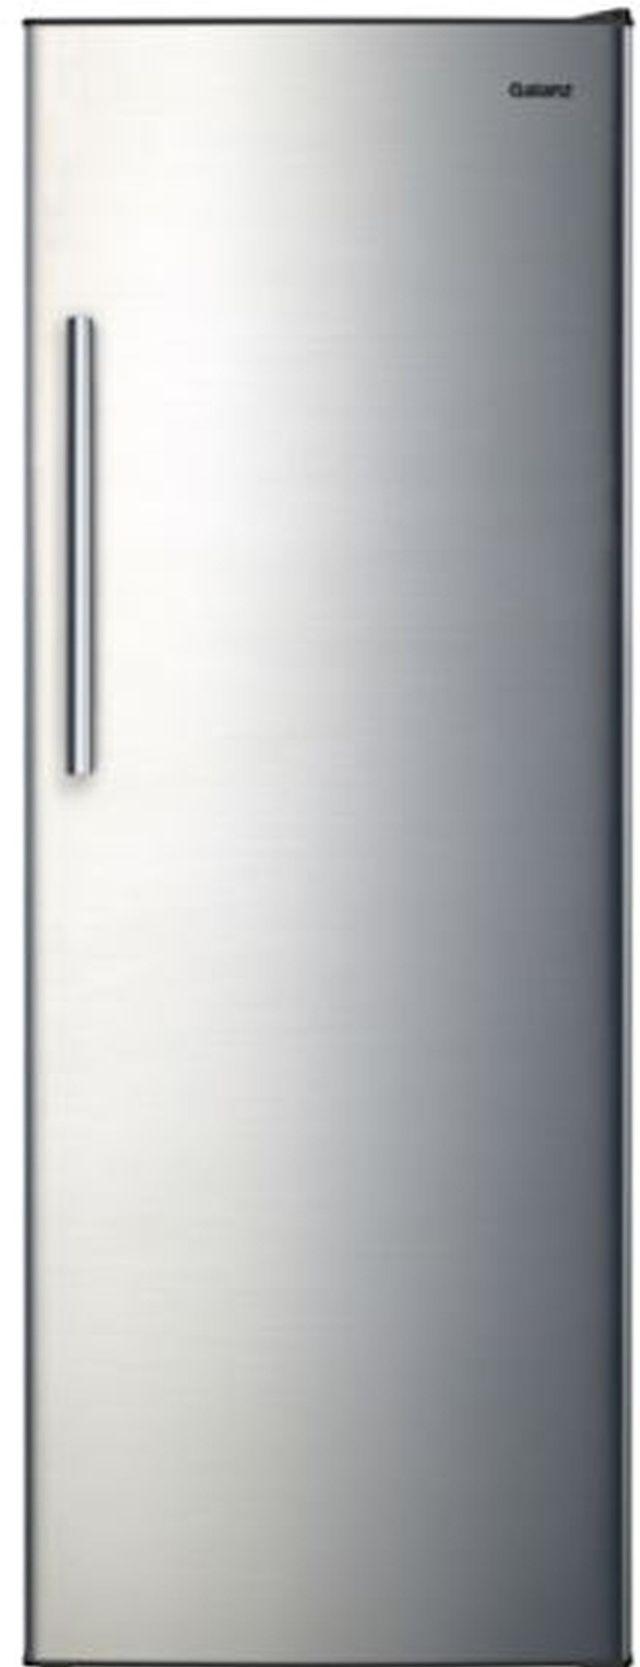 Galanz 11 Cu. Ft. Stainless Steel Upright Freezer-GLF11US2A16